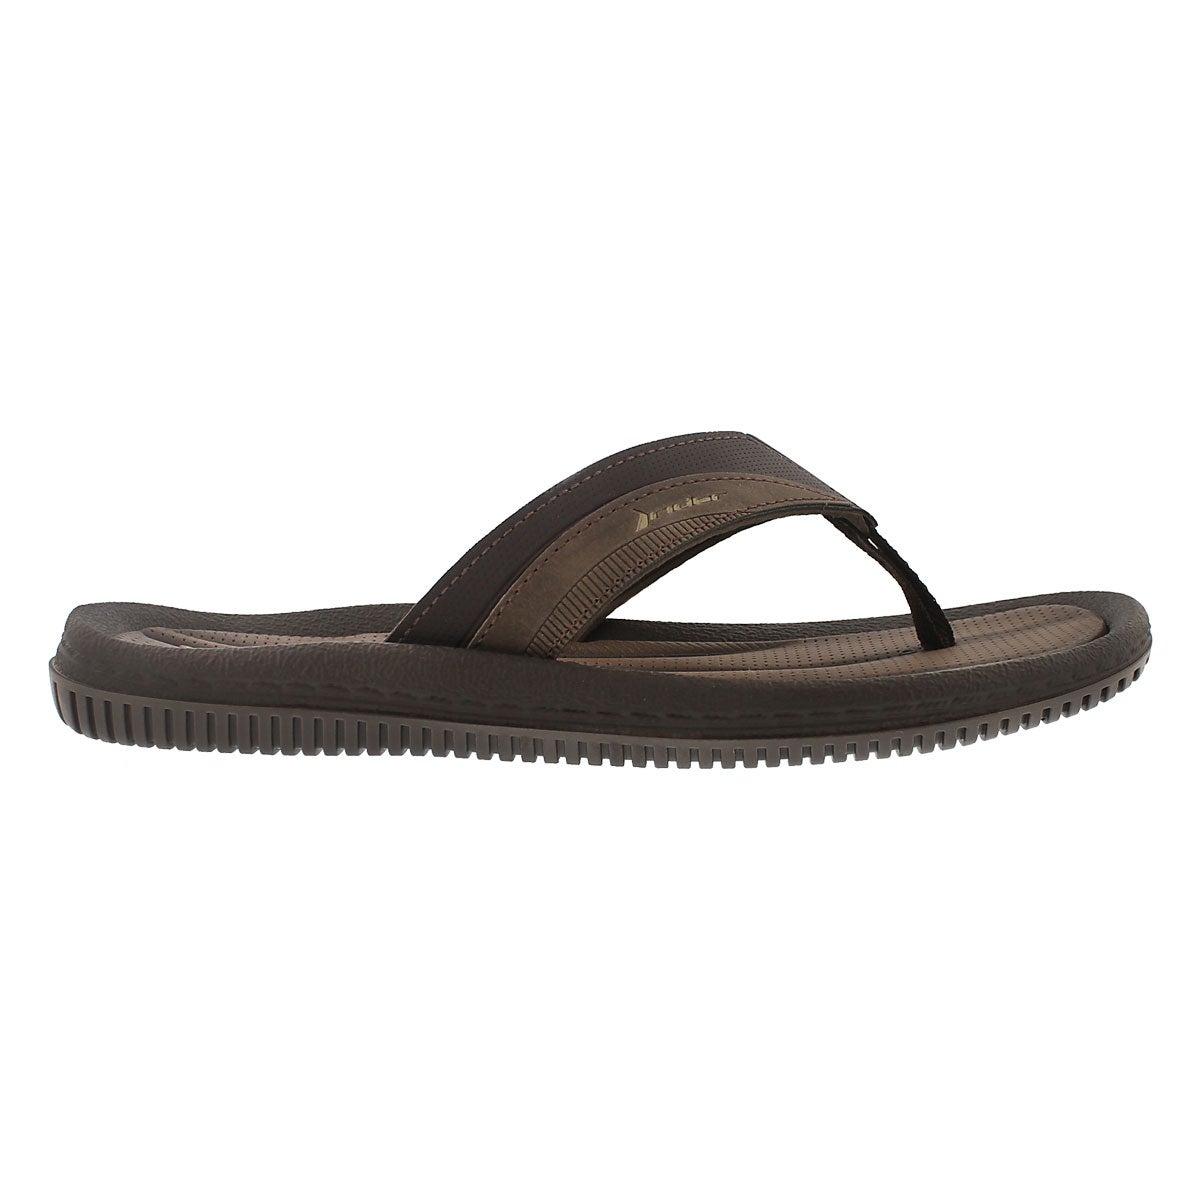 Mns Dunas XI brown flip flop